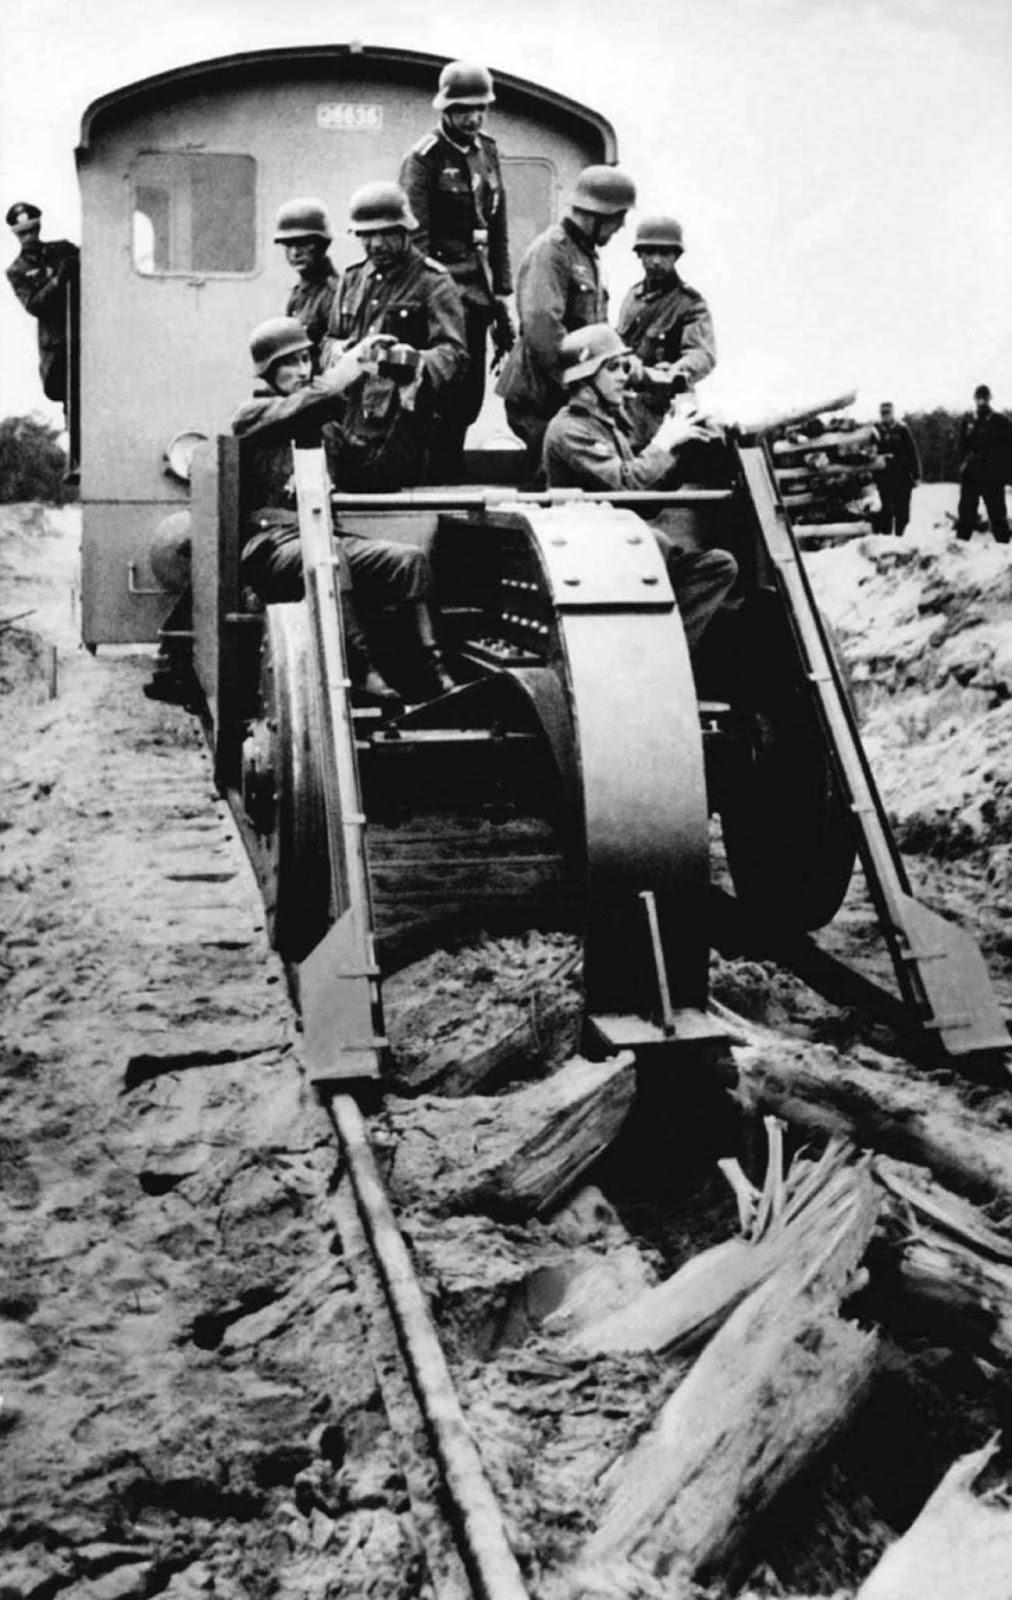 Diverses photos de la WWII - Page 2 81415